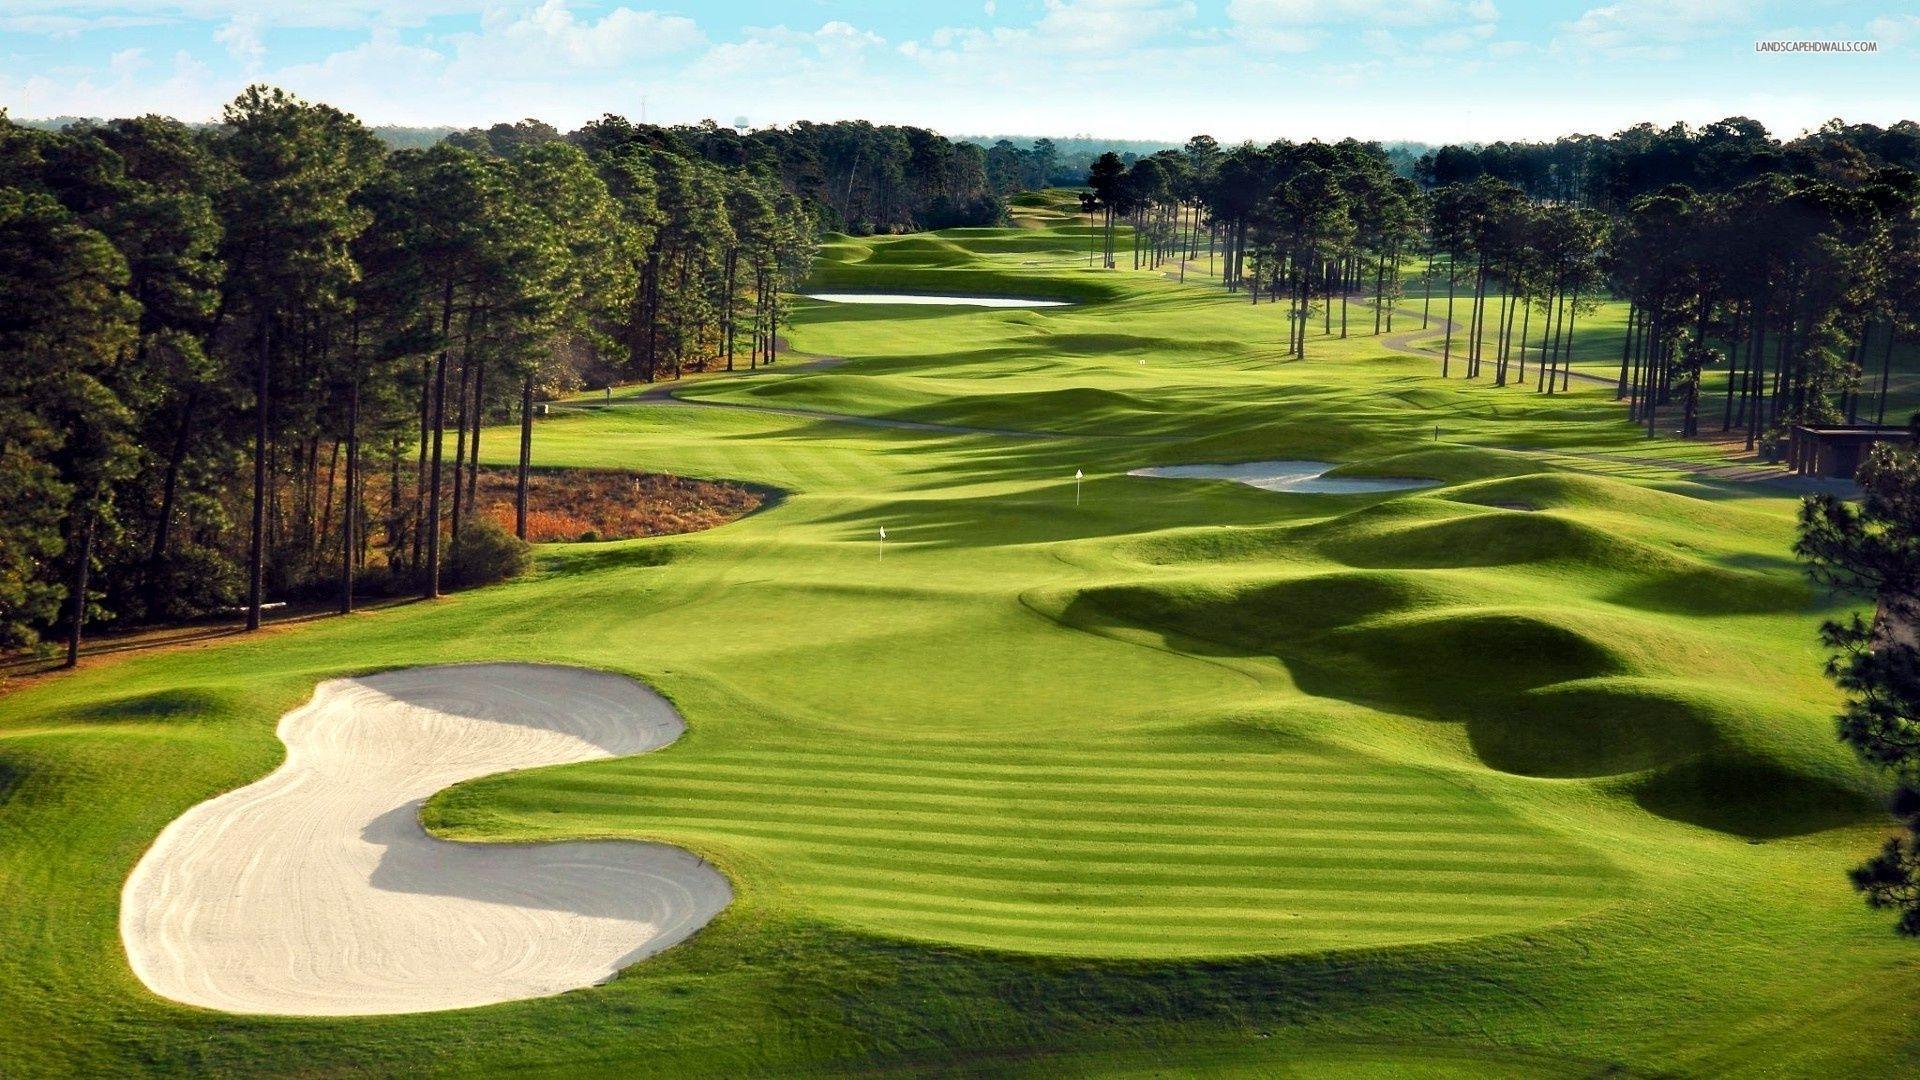 golf wallpaper - bdfjade